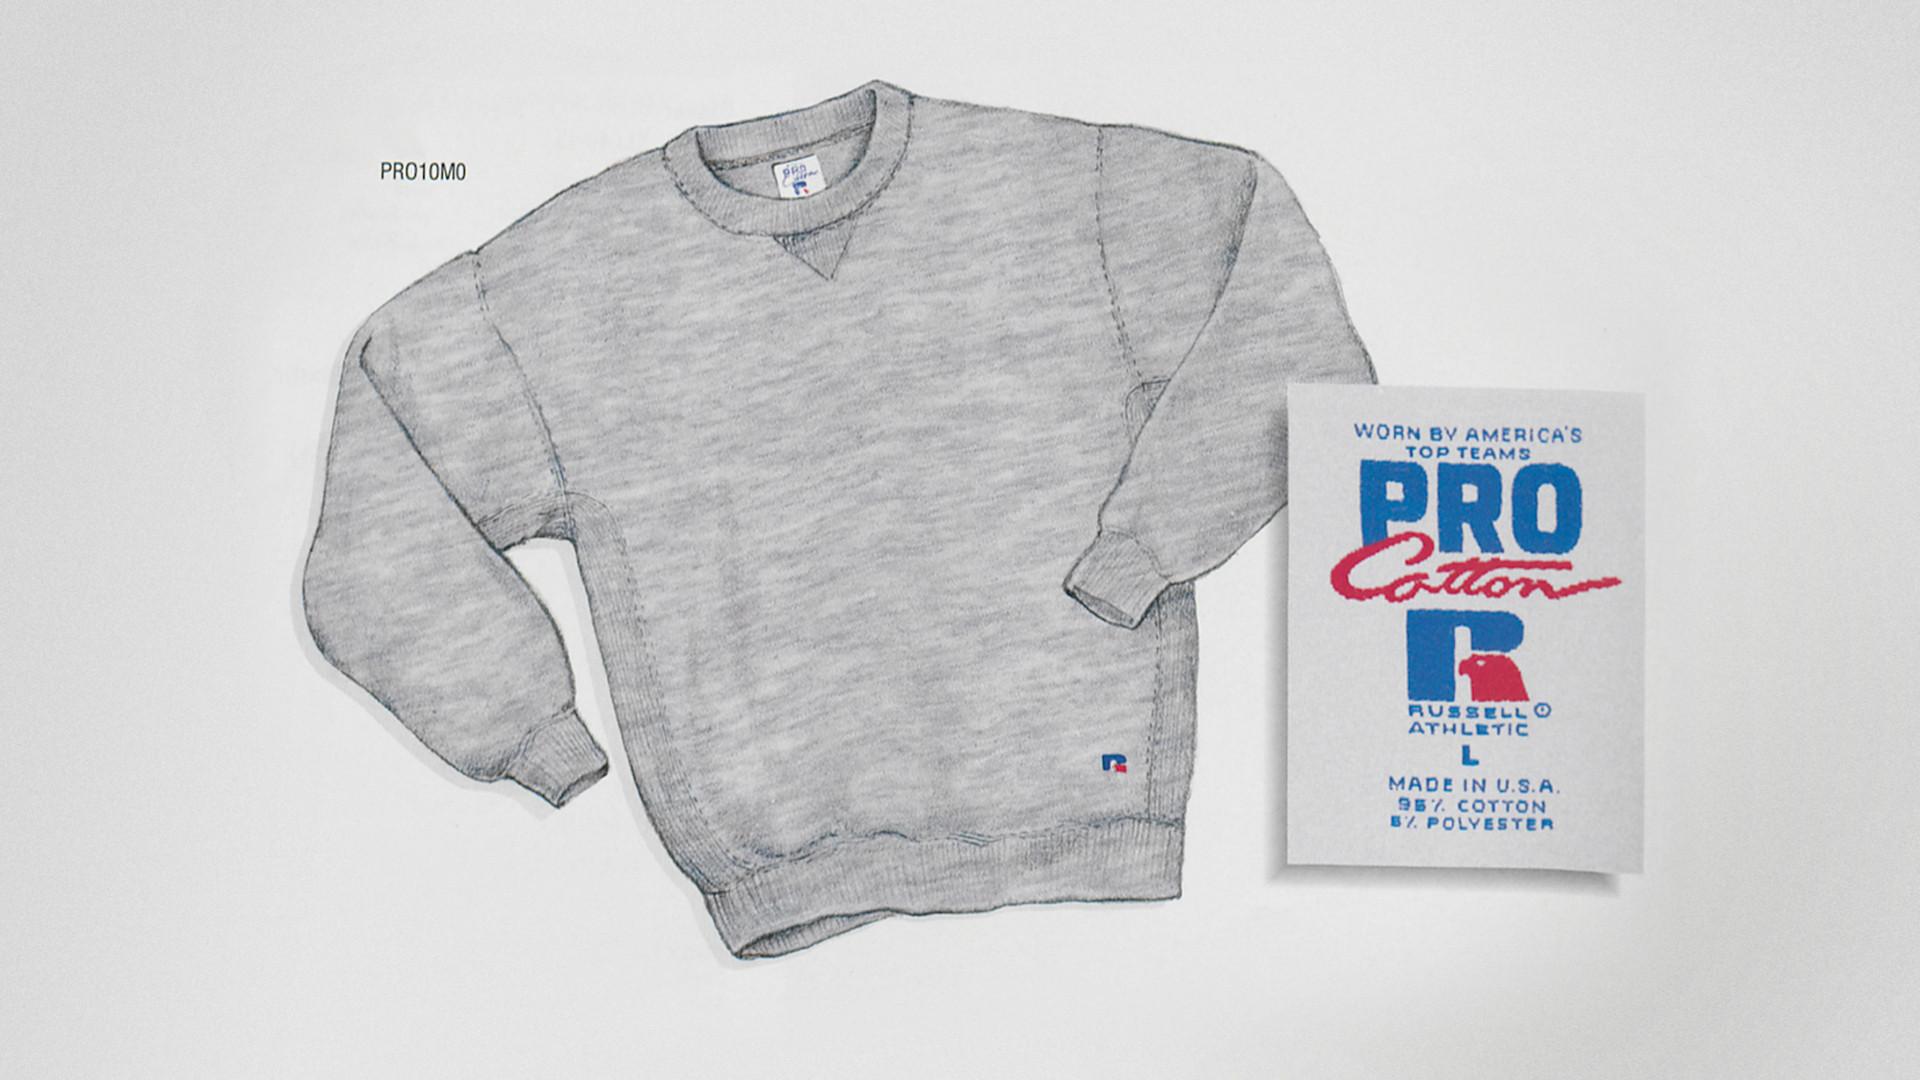 The Russell Athletic sweatshirt